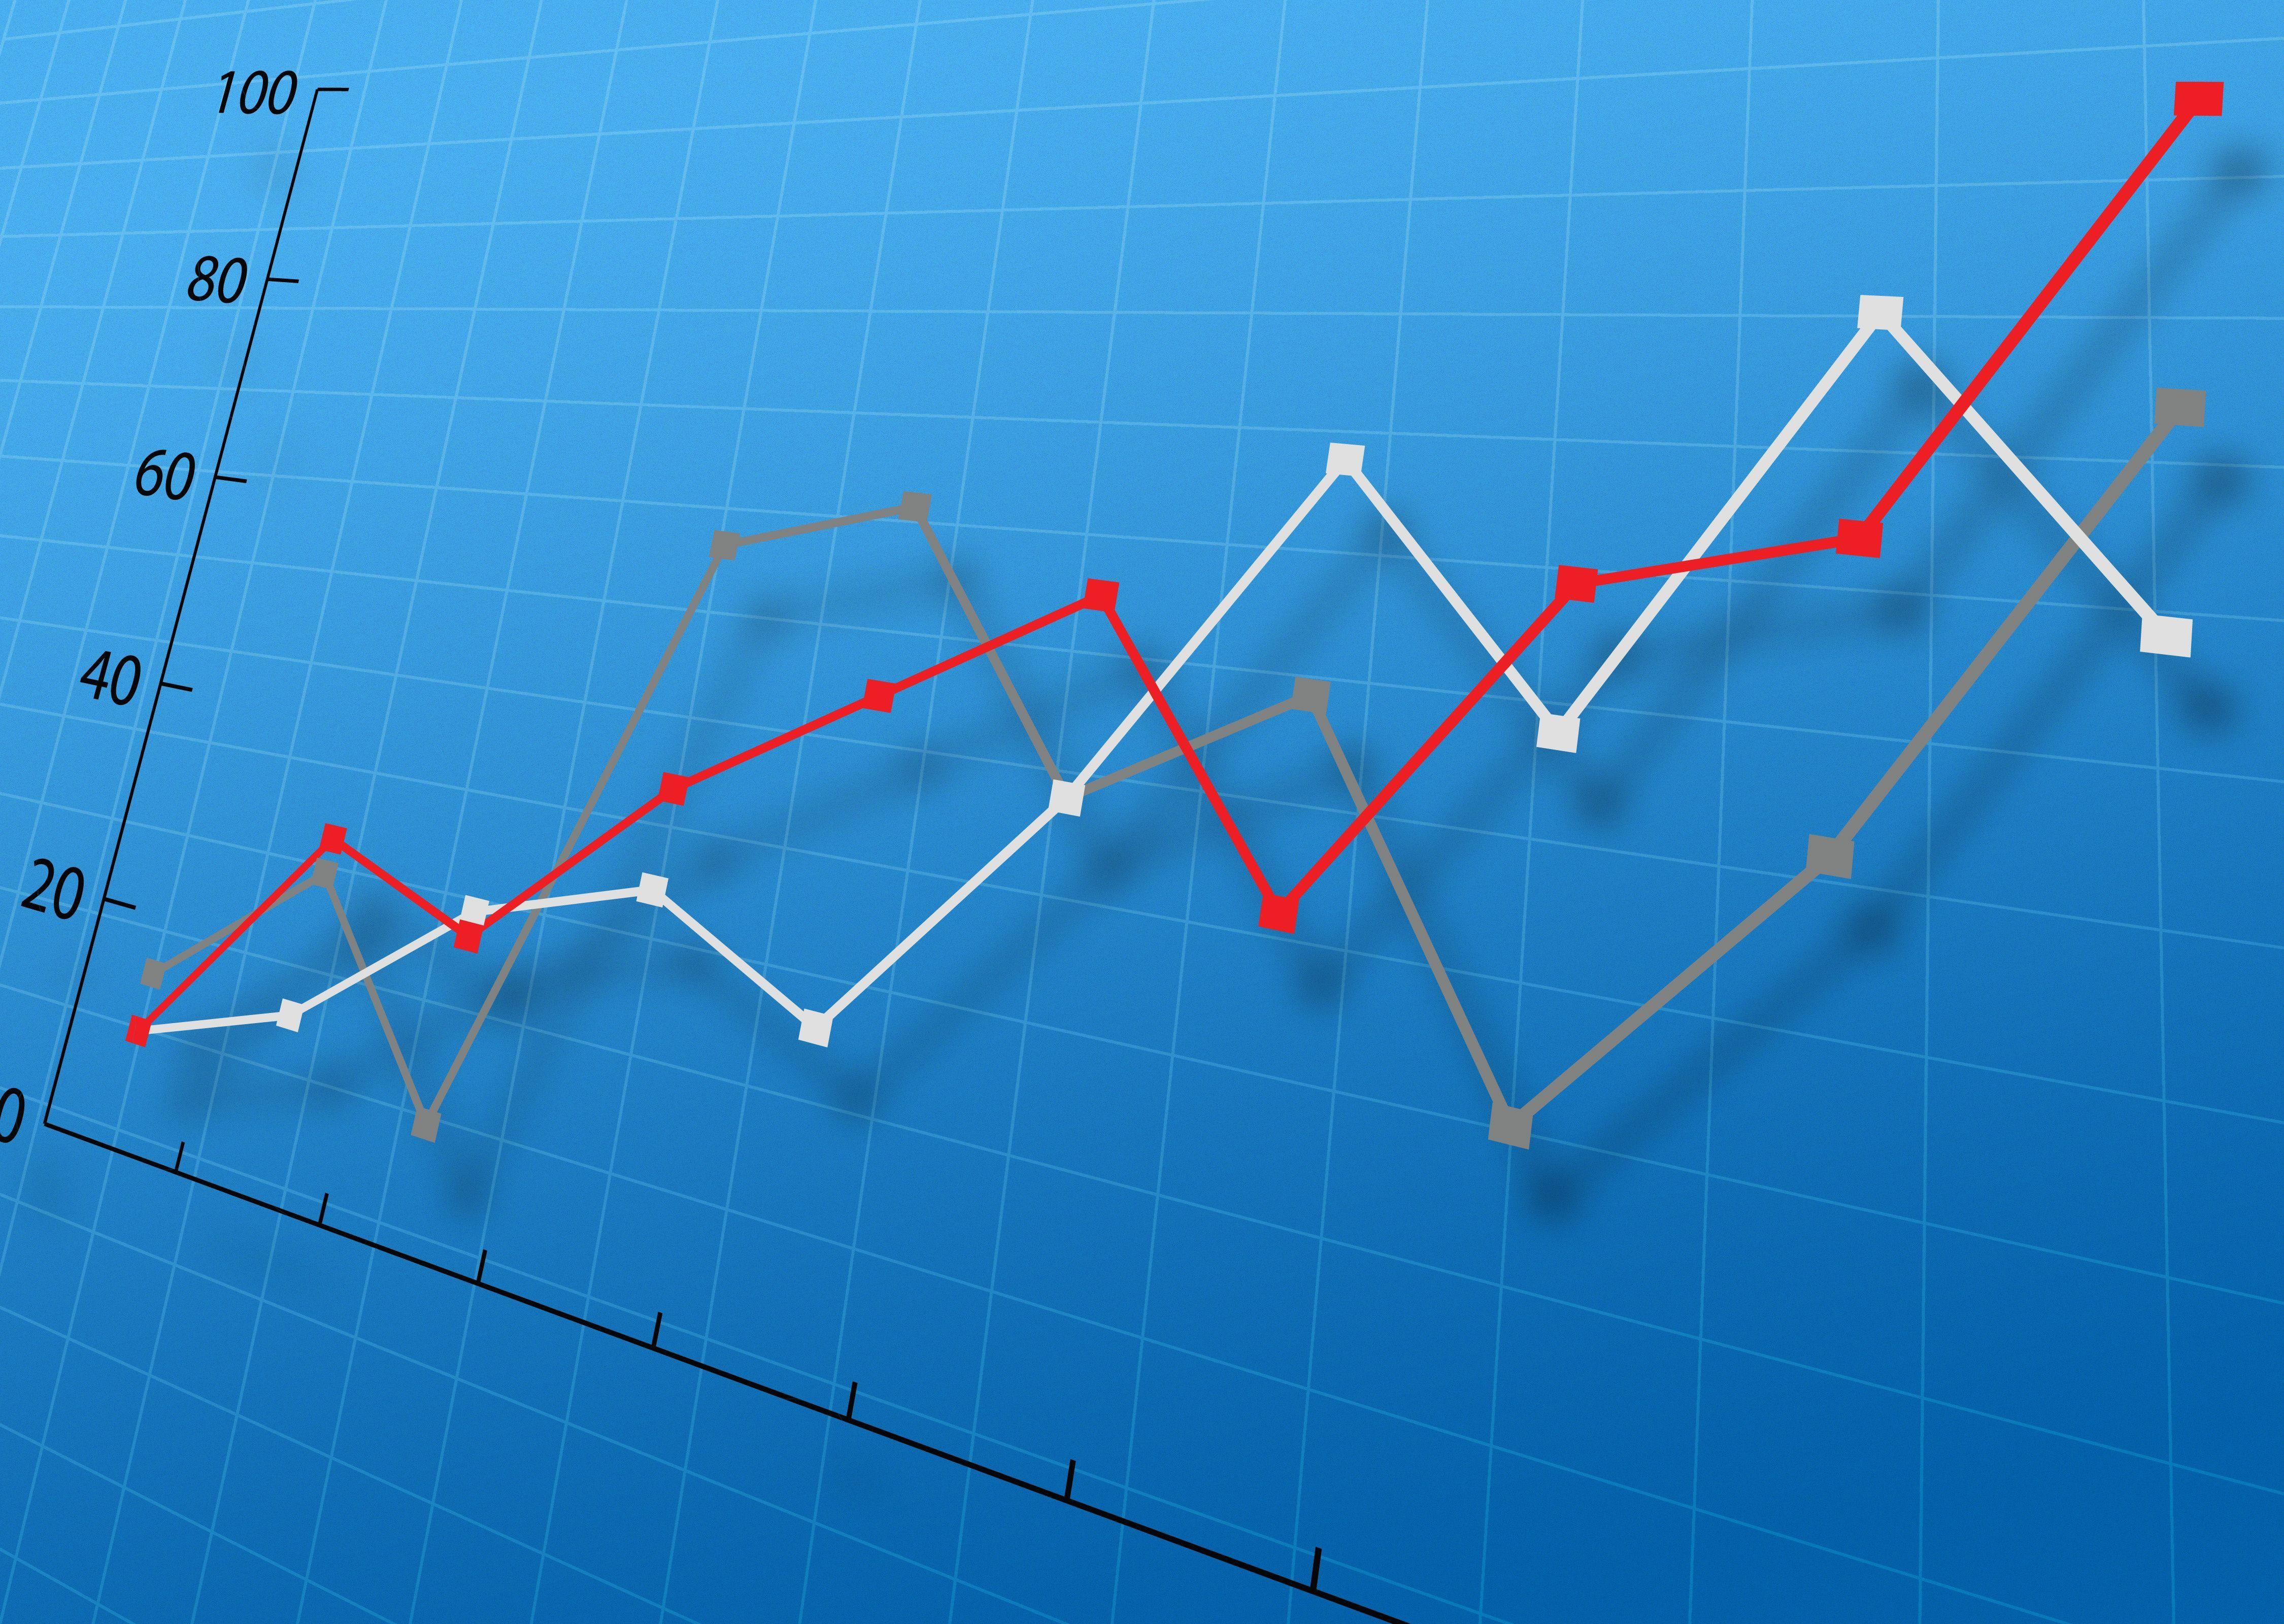 IVA Statistics